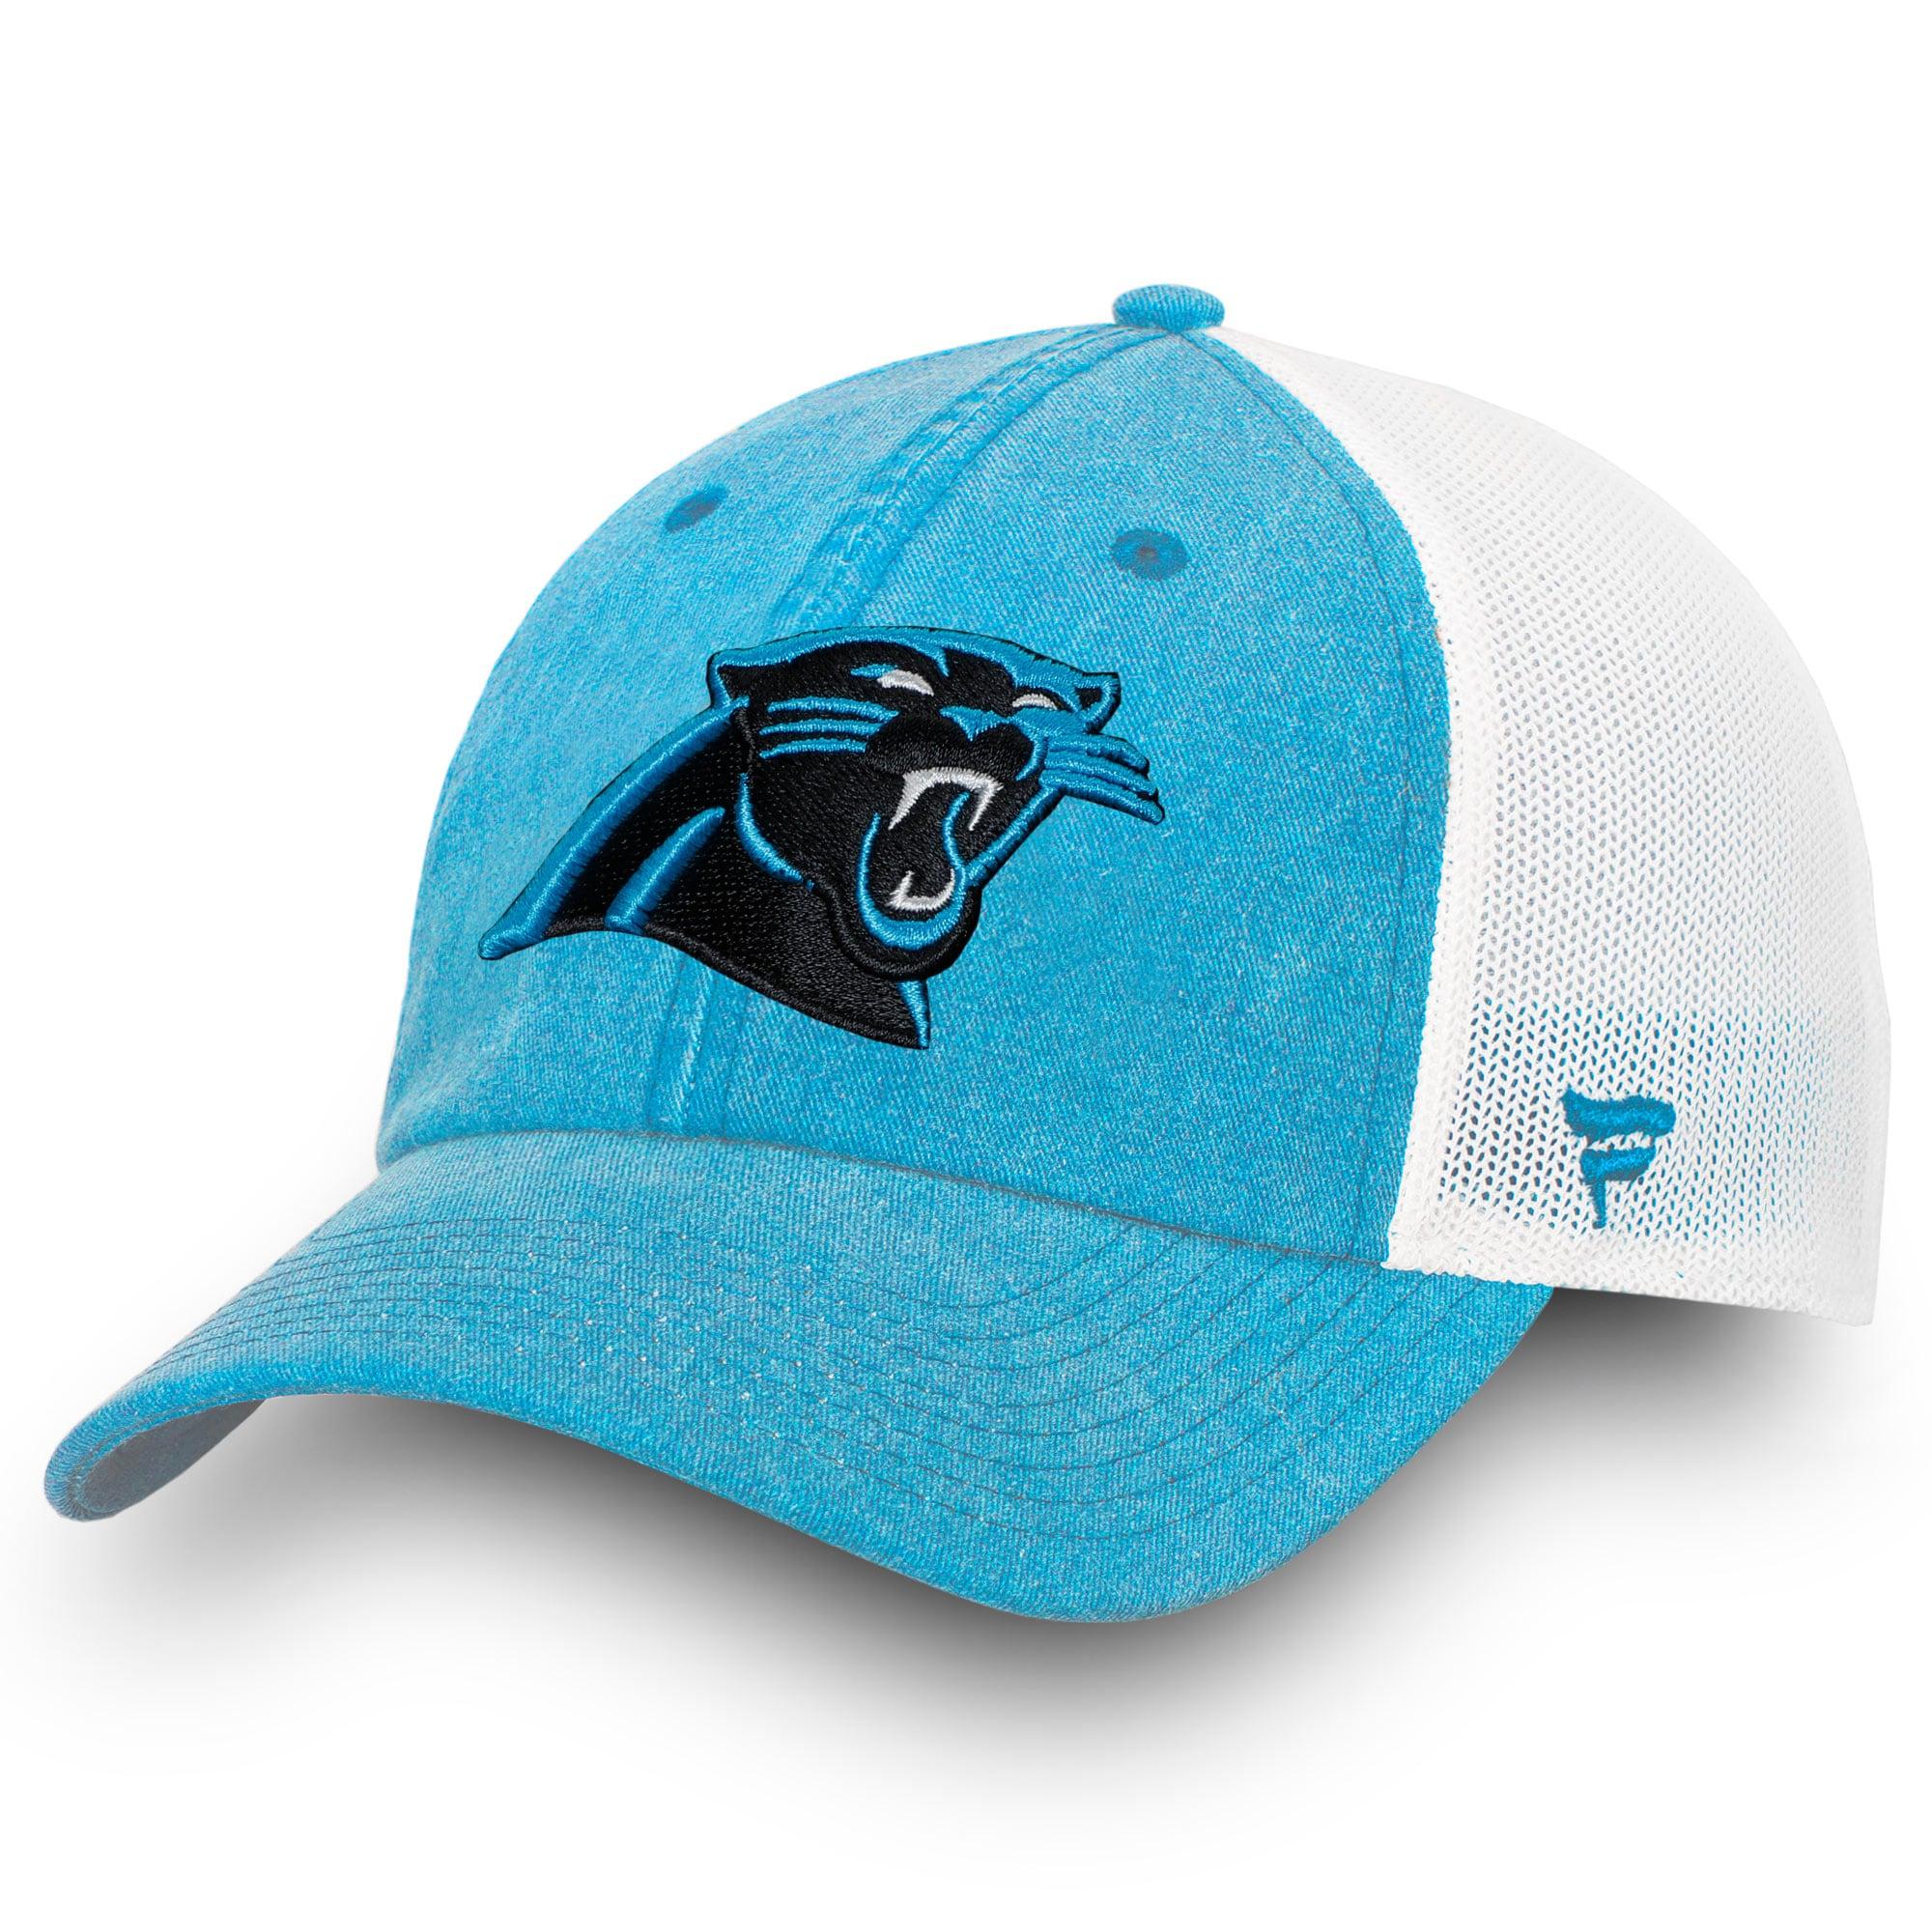 Carolina Panthers NFL Pro Line by Fanatics Branded Timeless Fundamental Adjustable Trucker Hat - Blue/White